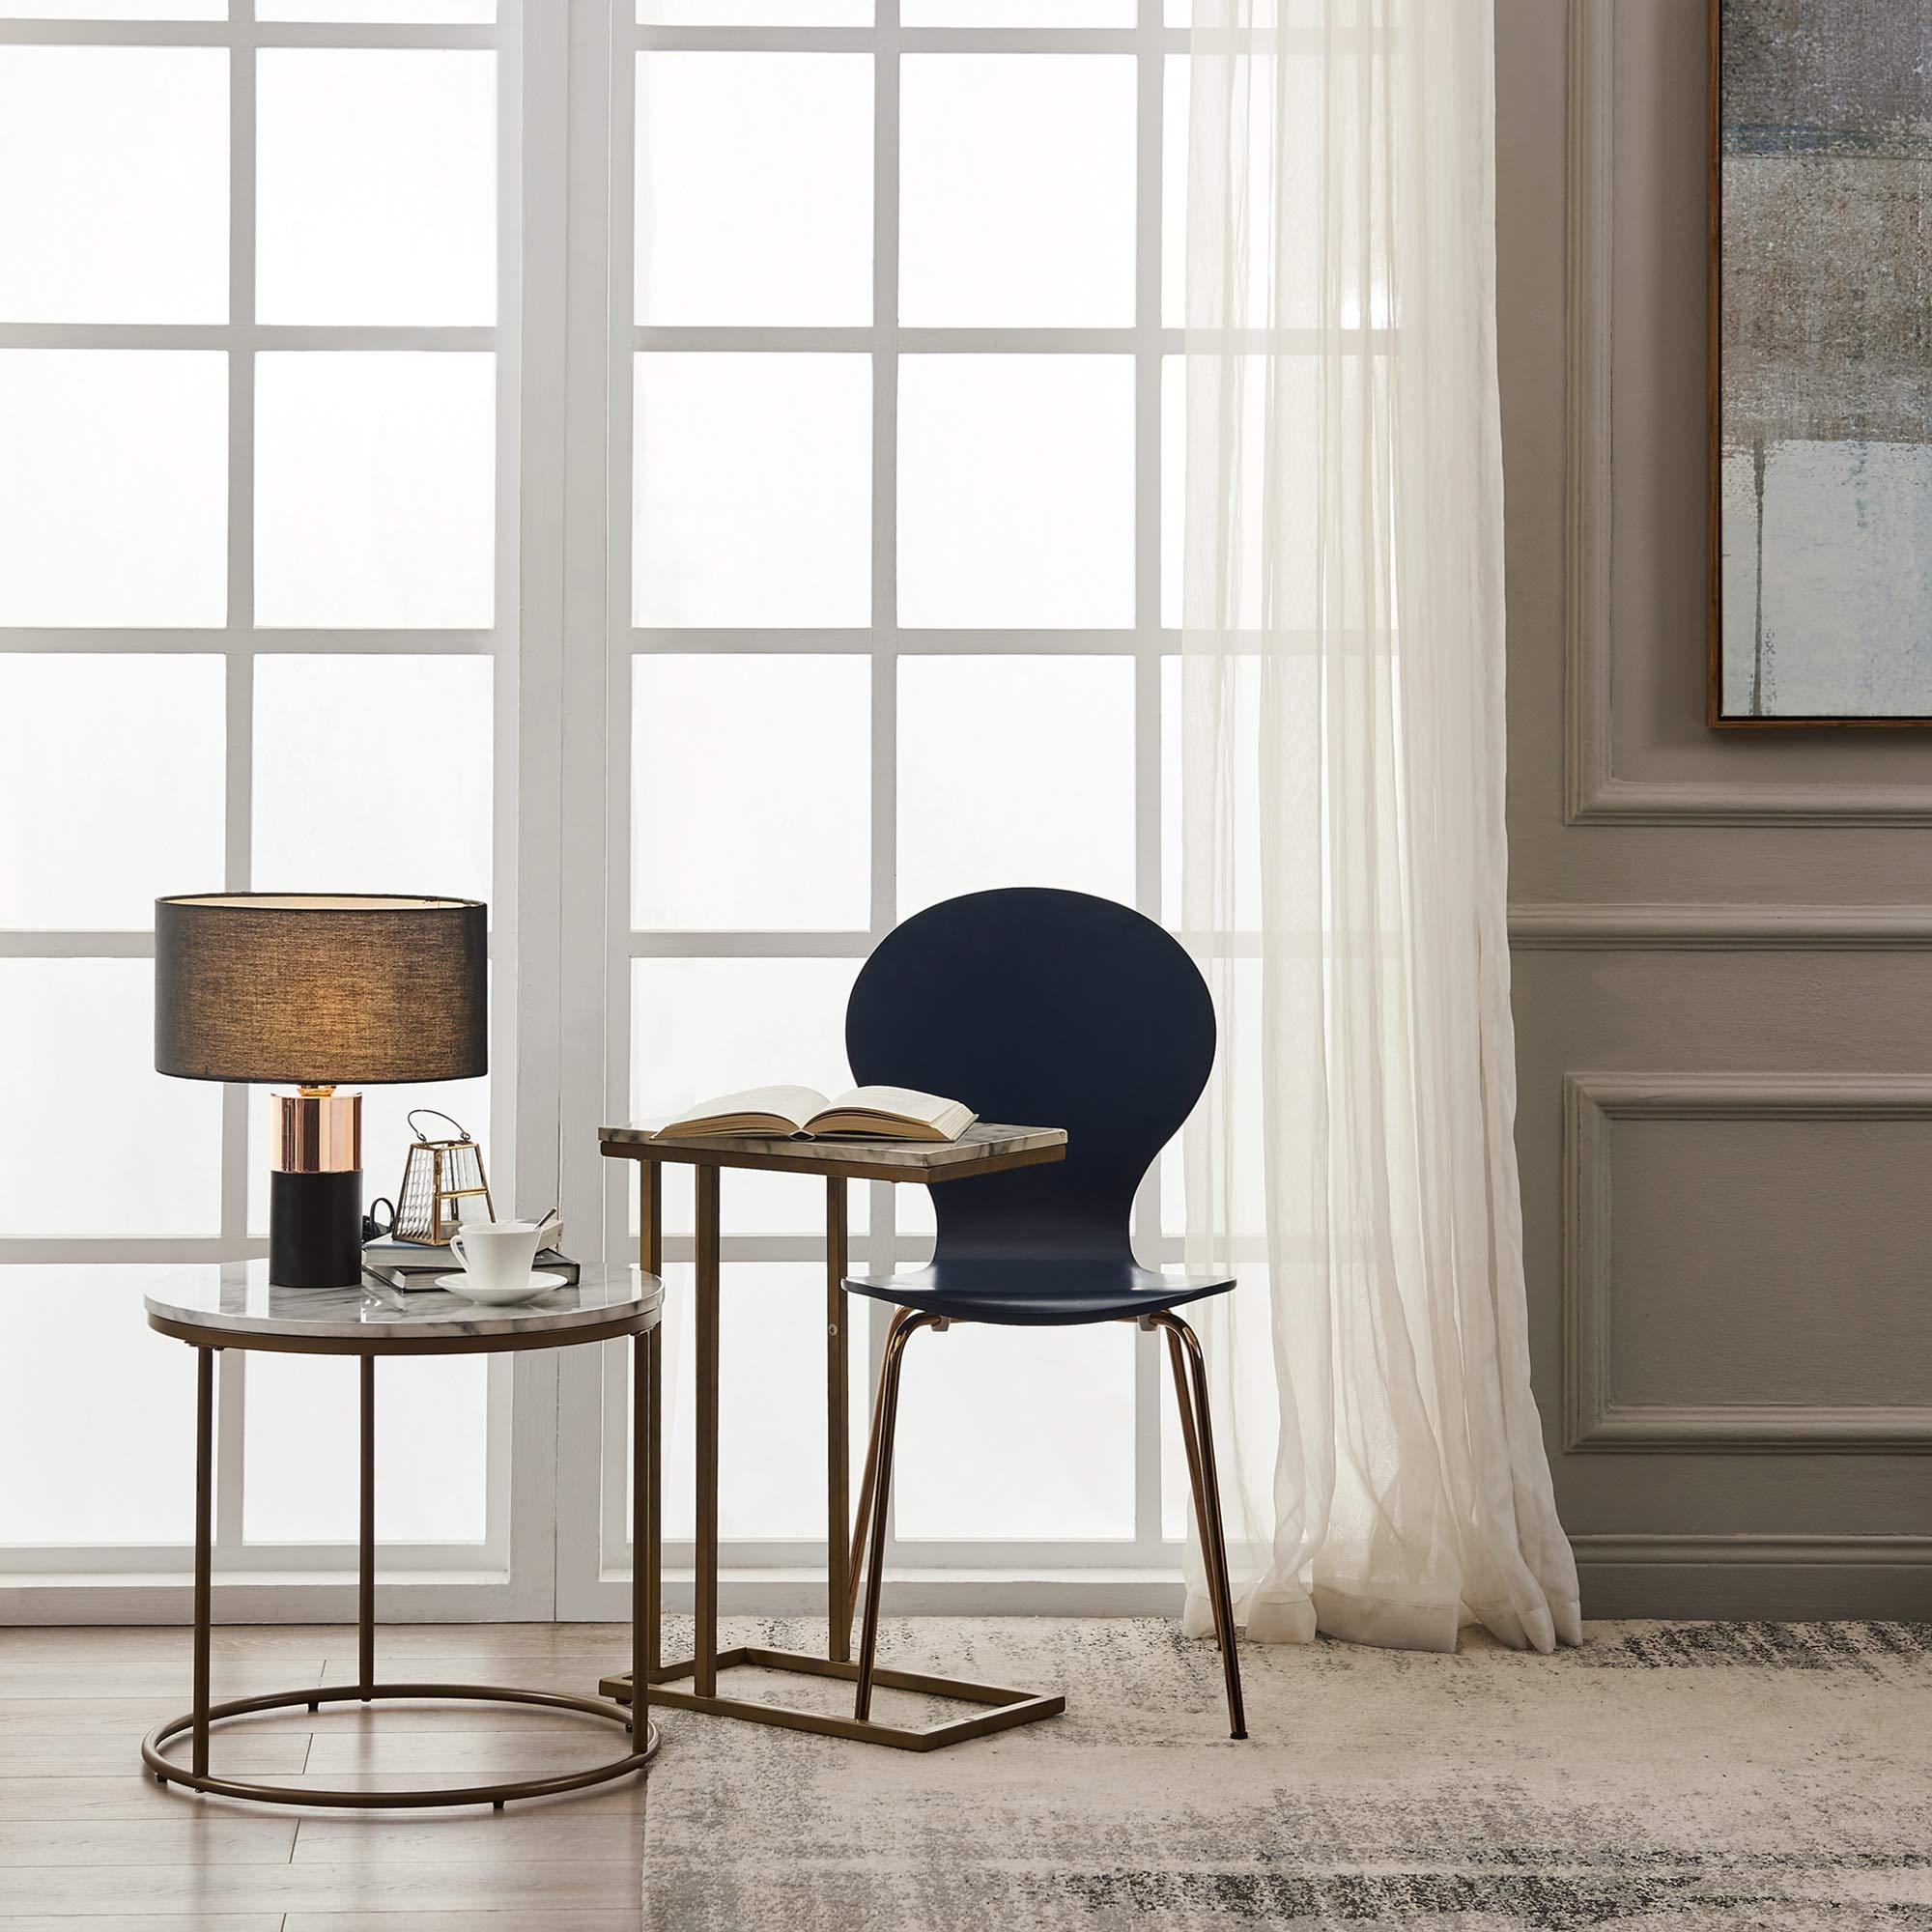 Versanora - Marmo C Shape Table - Faux Marble /Brass by Versanora (Image #3)